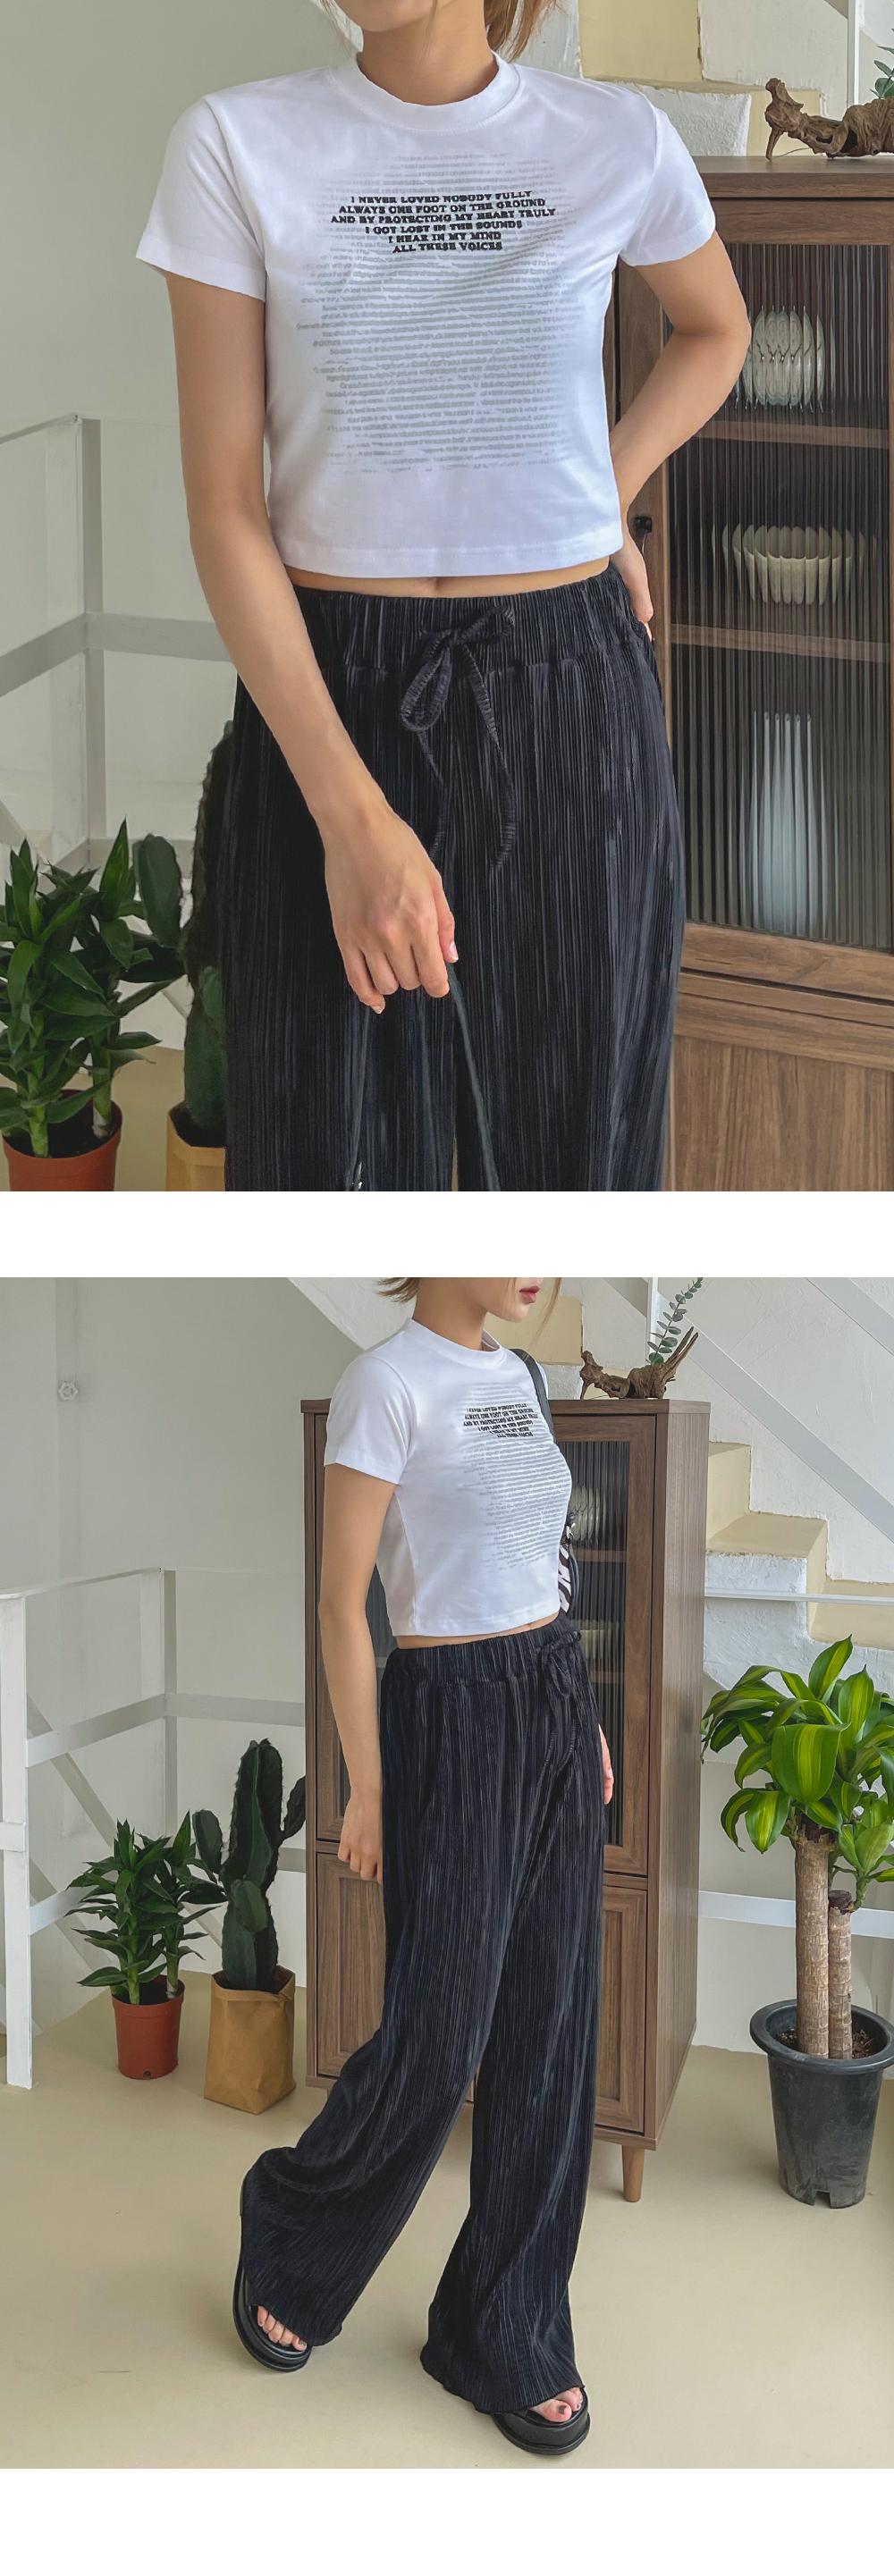 Kiken Lettering Short Sleeve Crop Tee